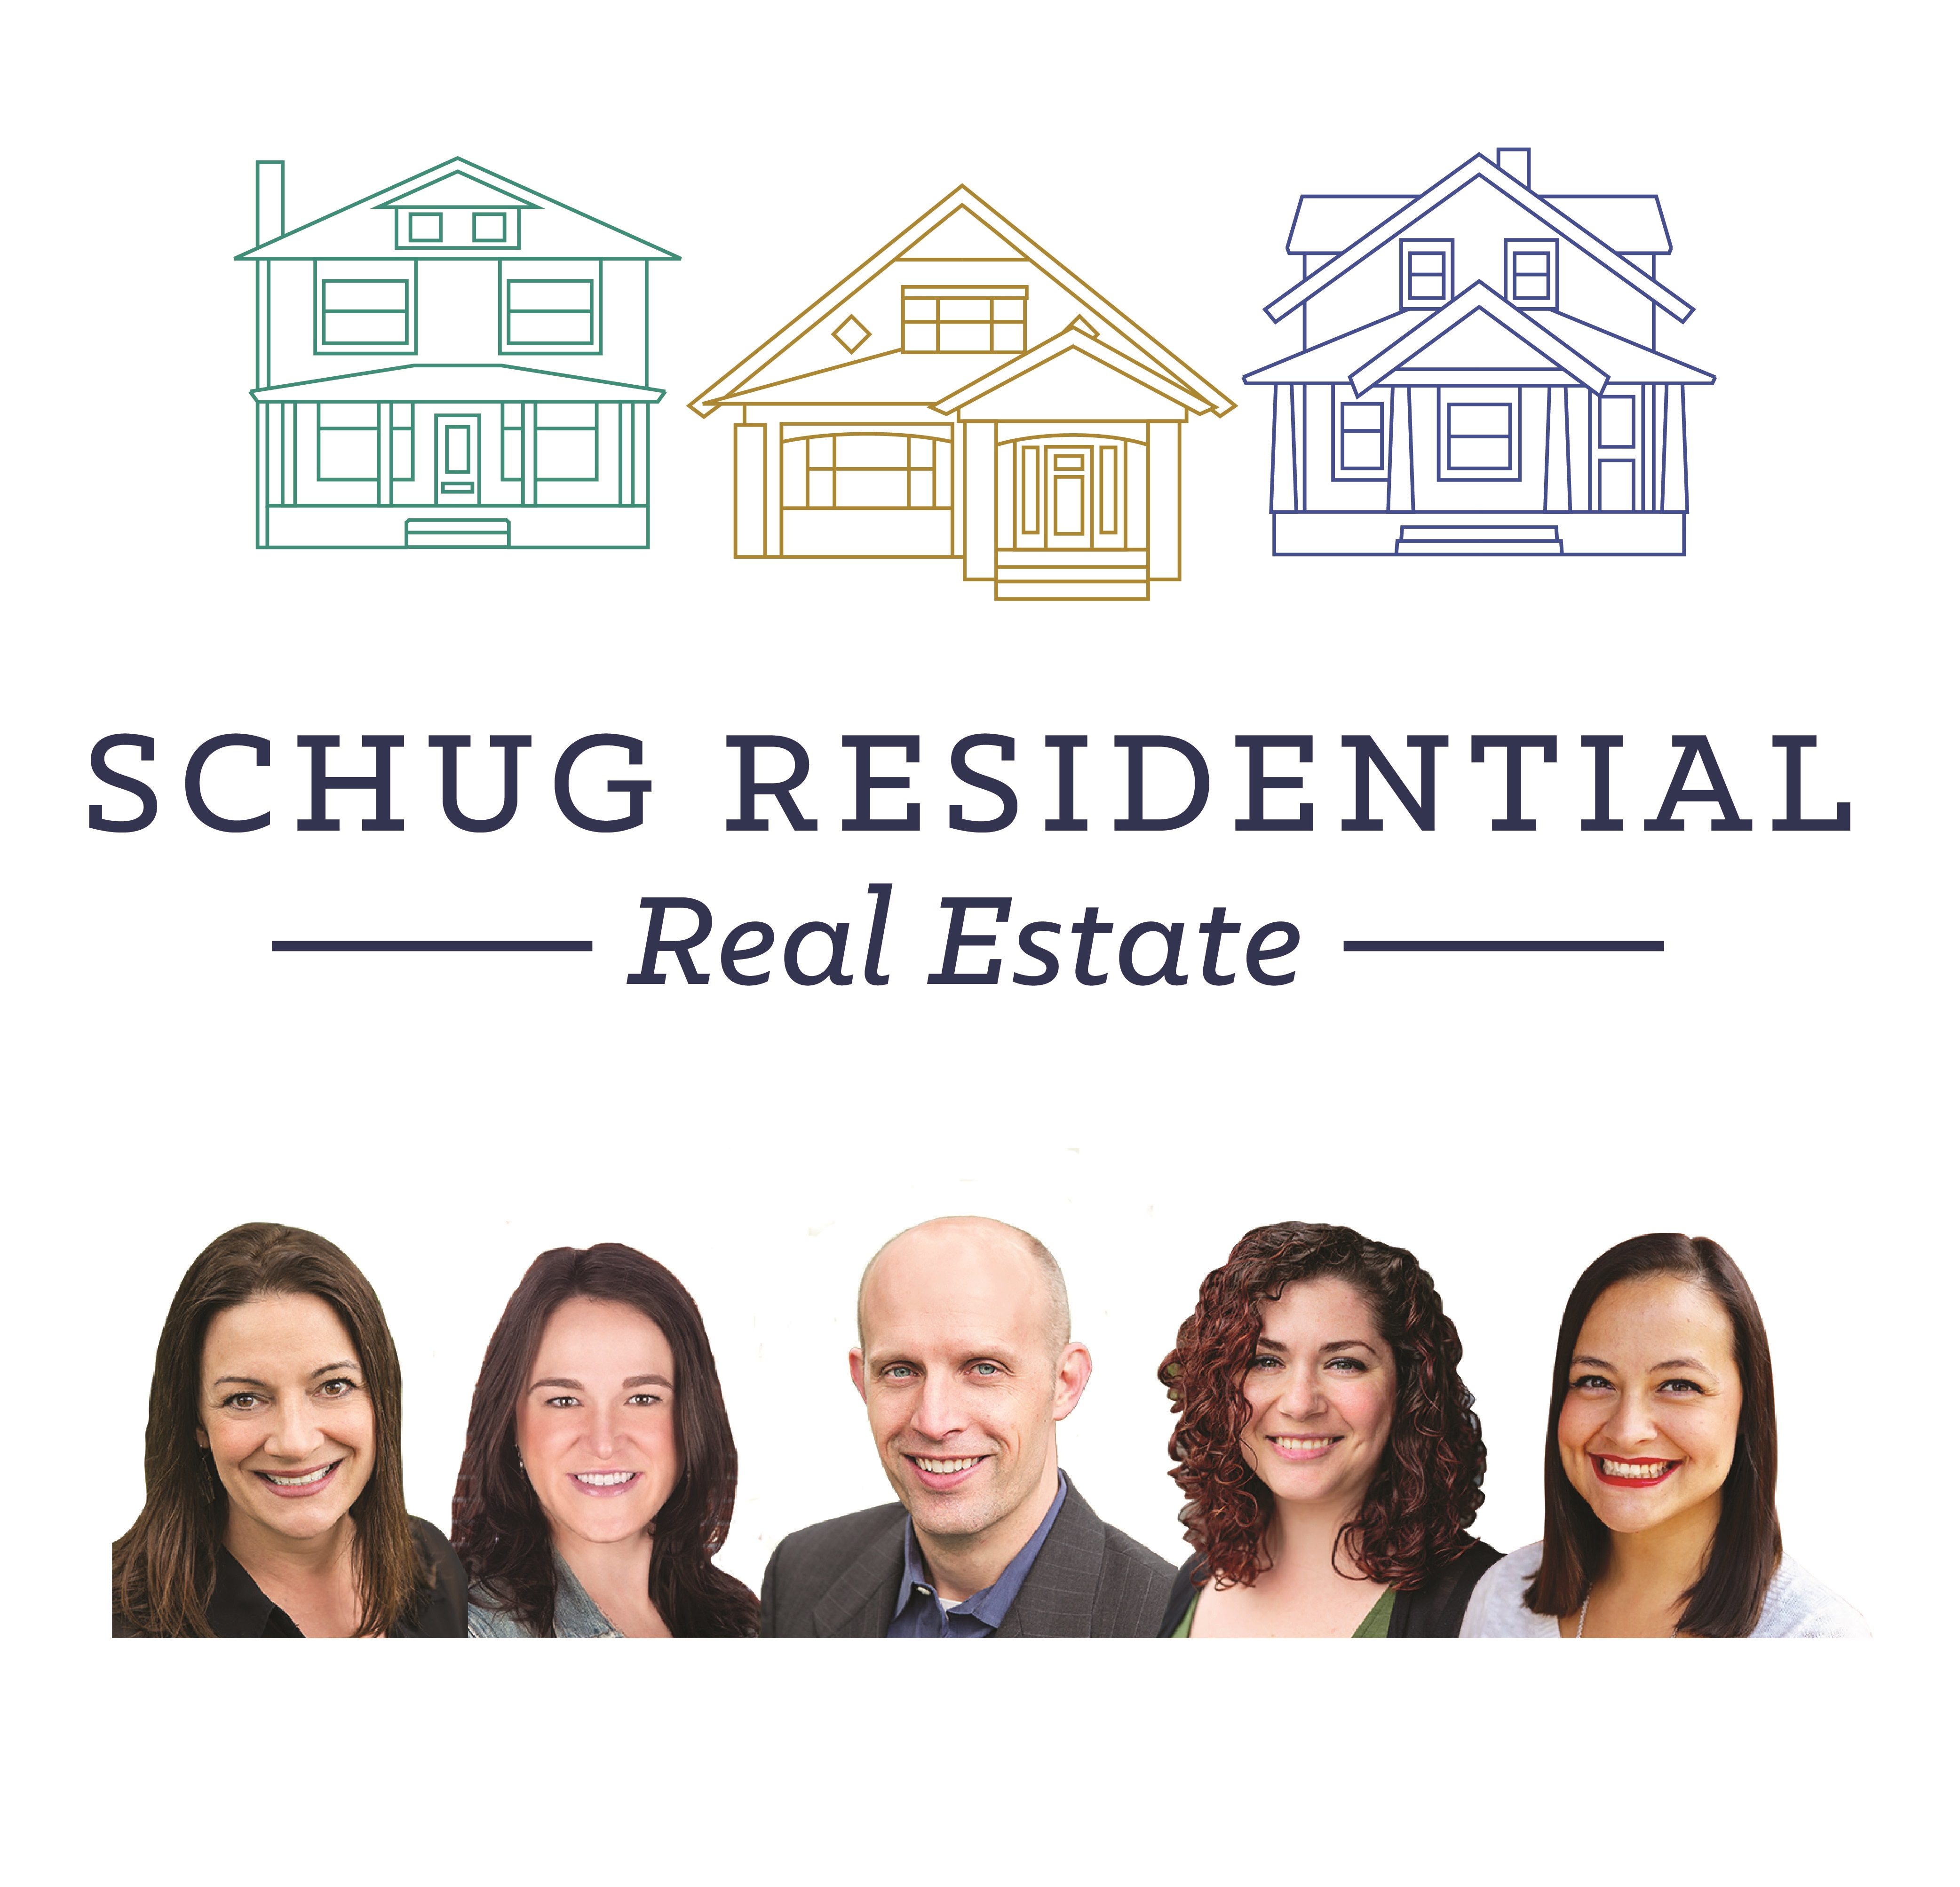 Schug Residential Color Main Team Photo